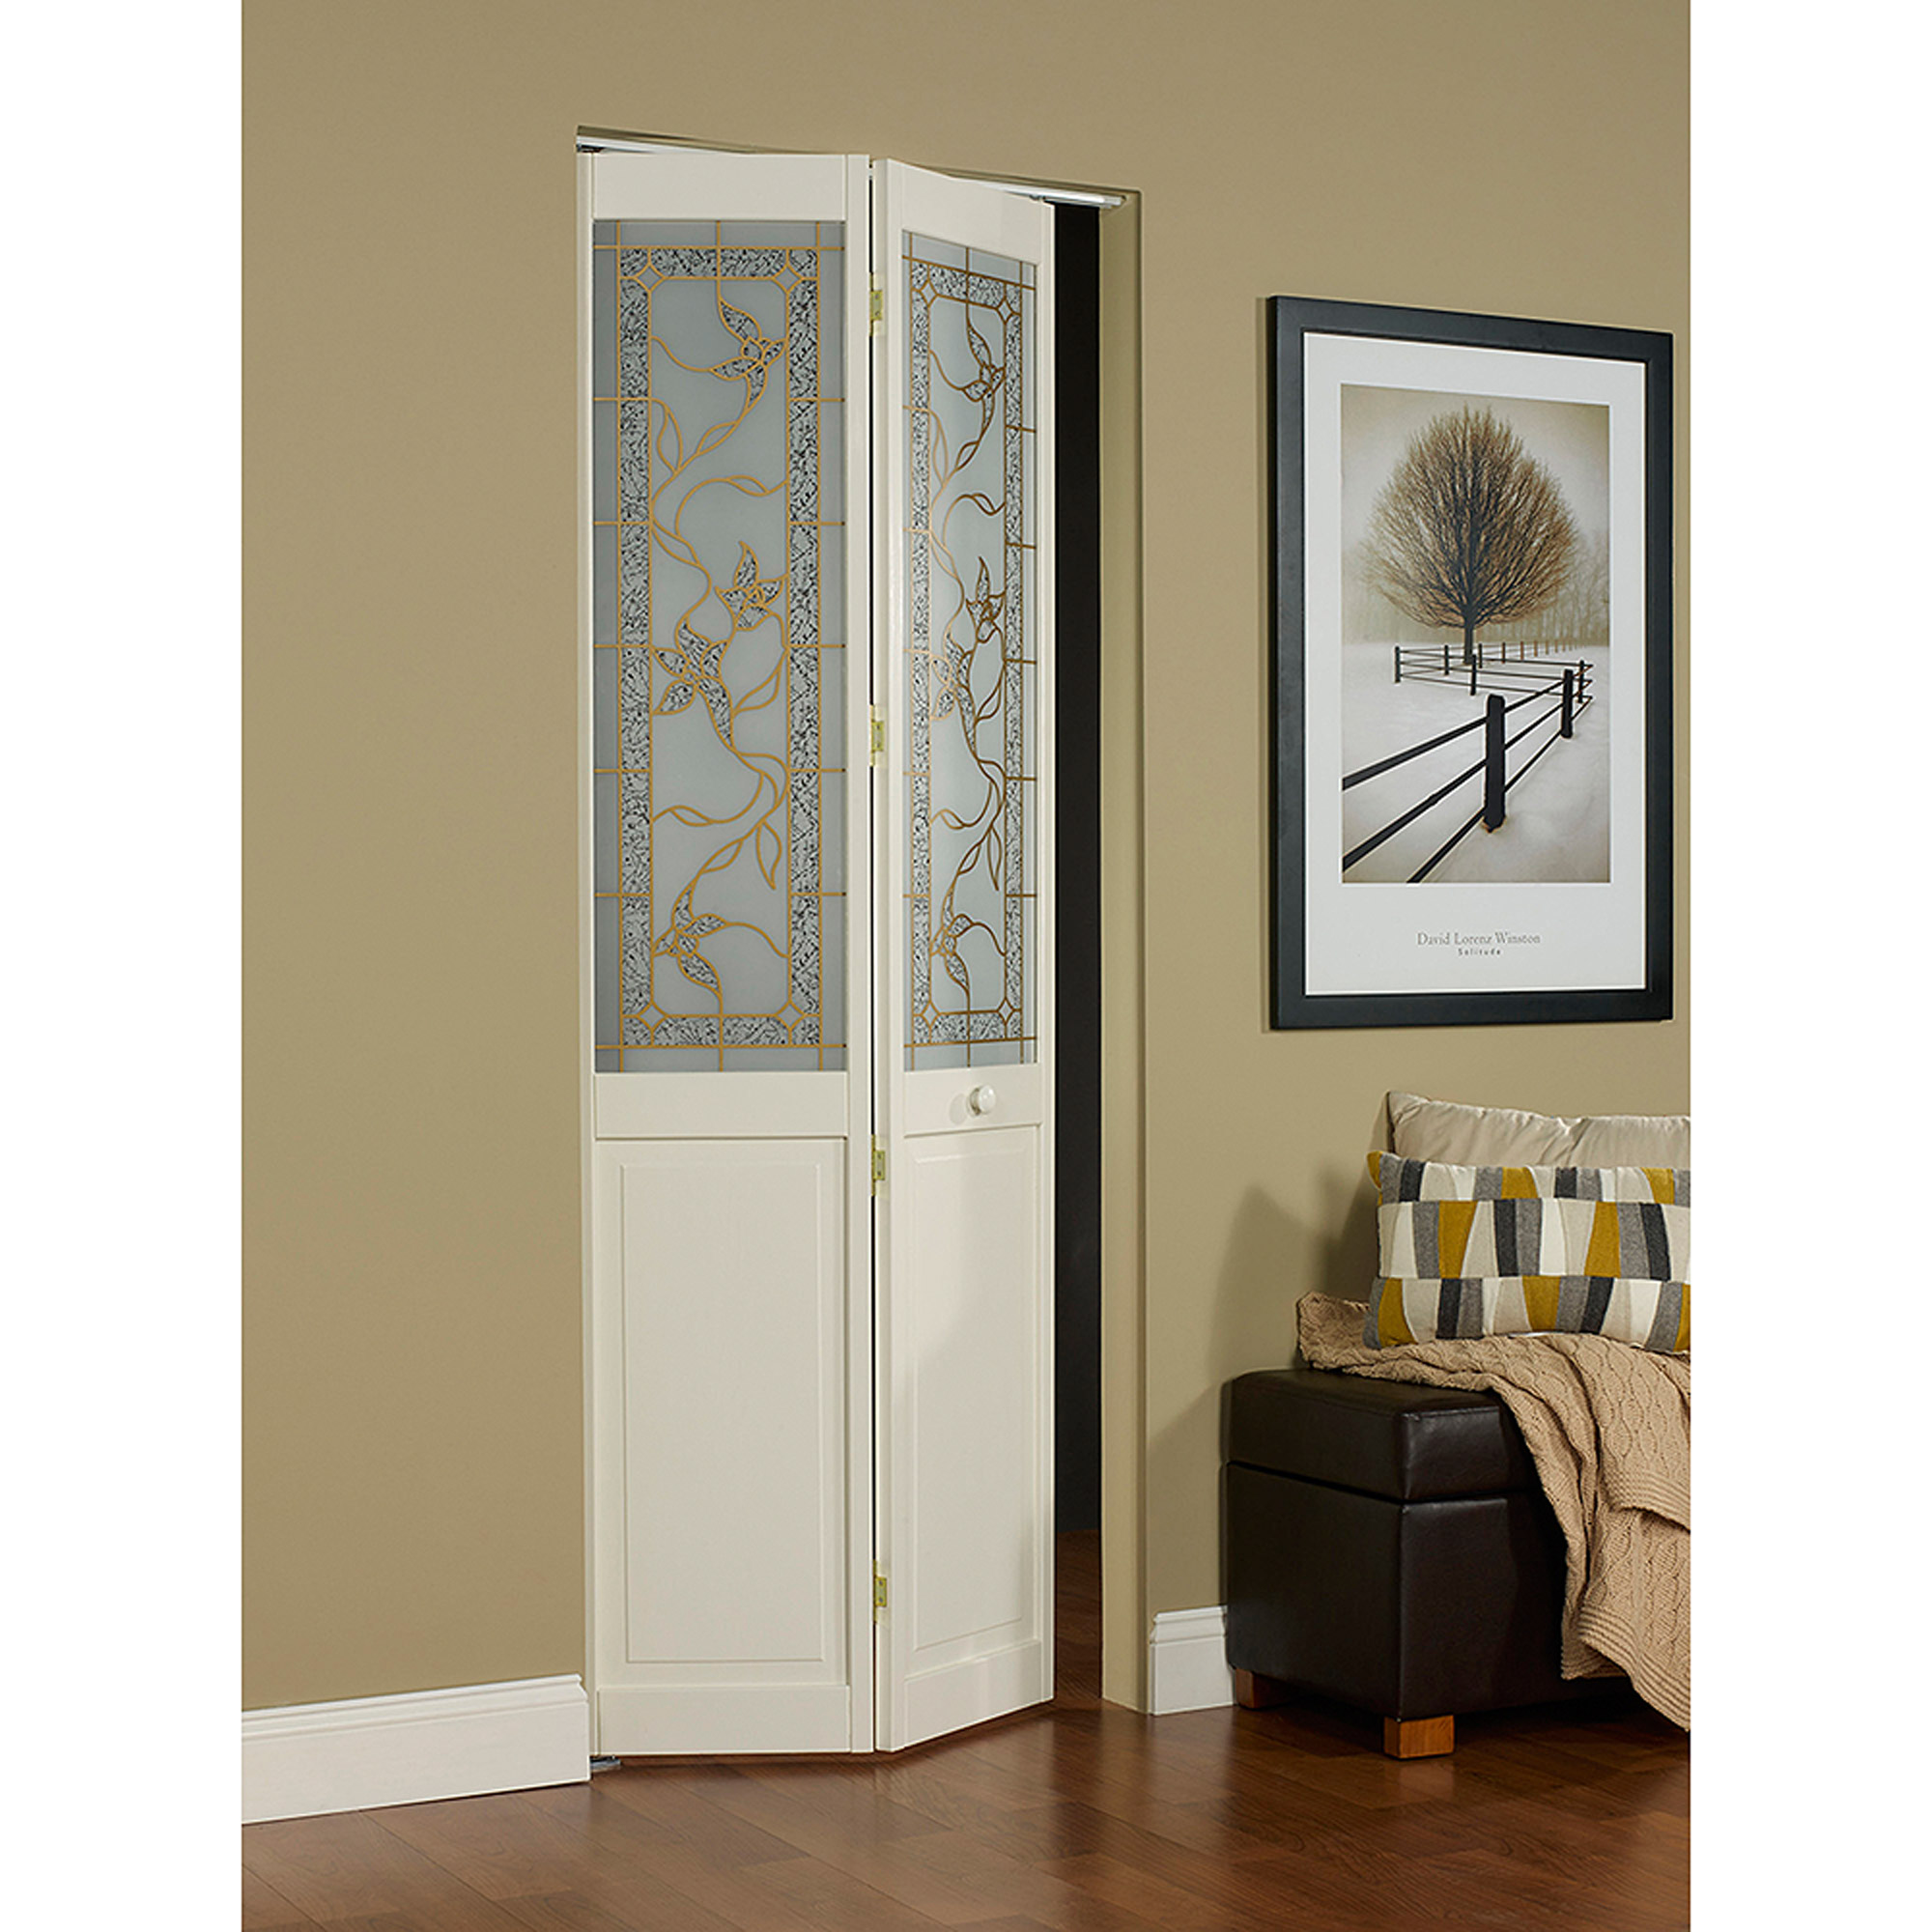 "AWC Giverny Decorative Glass 36"" x 80.5"" Bifold Door"